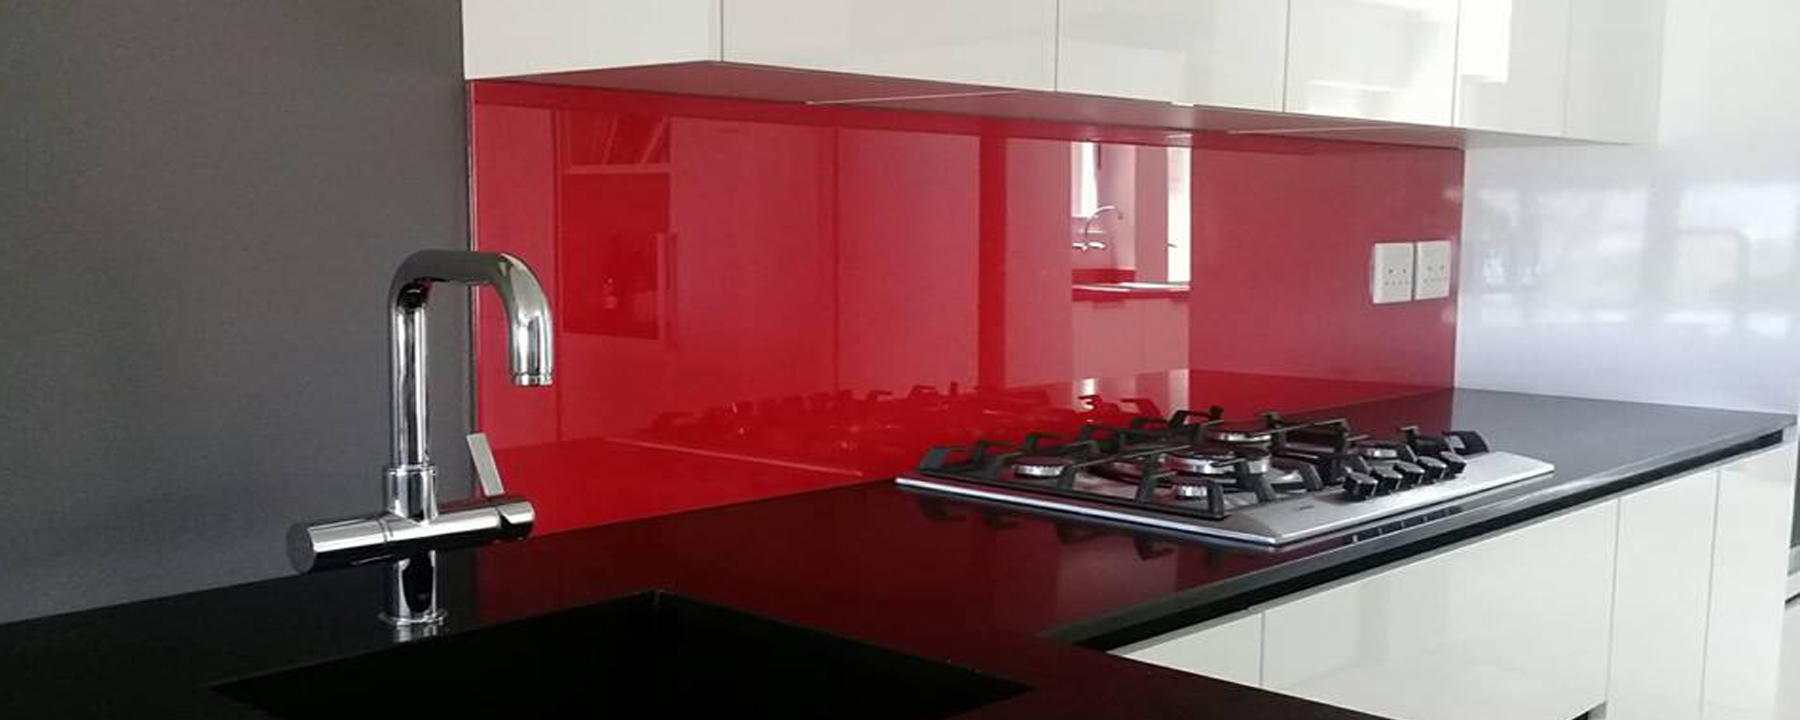 Master Glass & Aluminium – Master Glass and Aluminium, Knysna, Plett